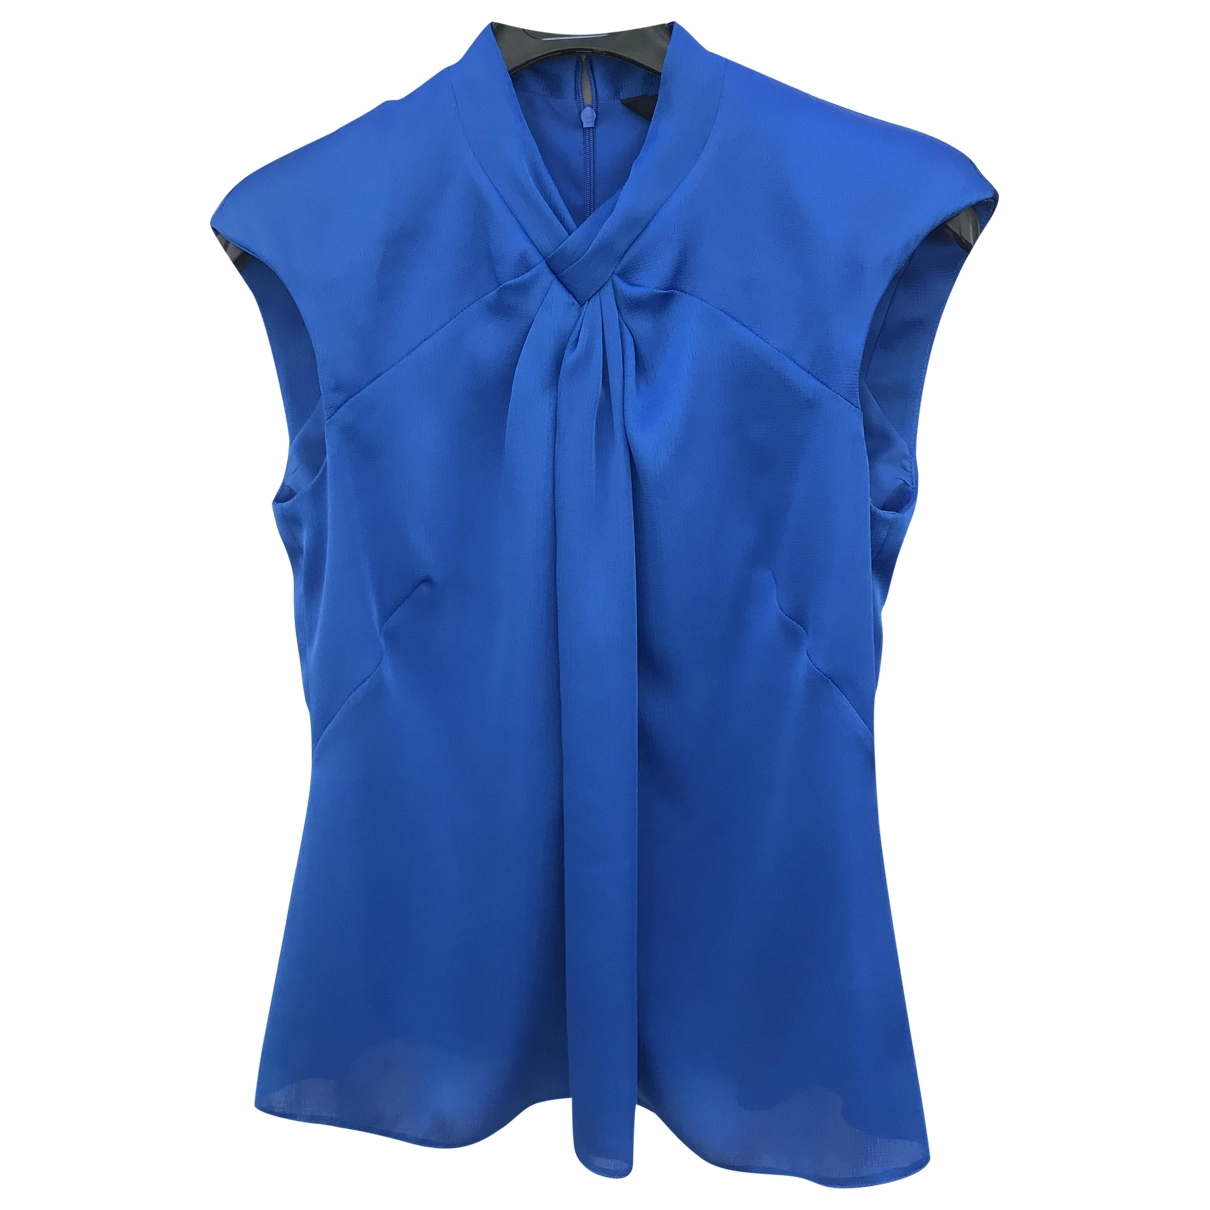 Karen Millen \N Lederjacke in  Blau Polyester